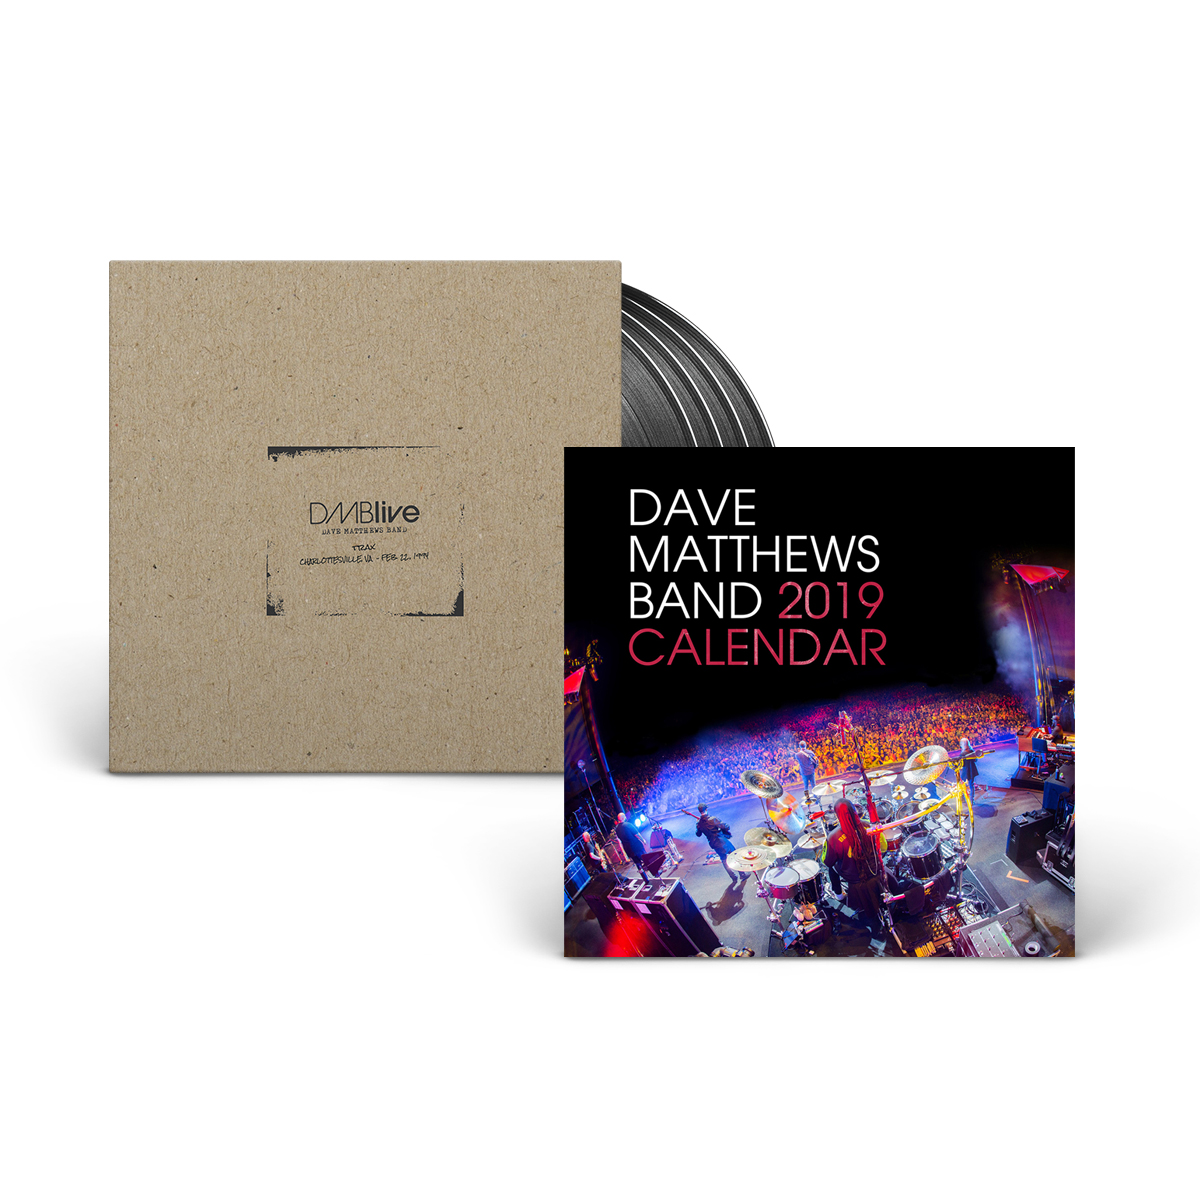 Dave Matthews Band - Trax Charlottesville, VA + Calendar Bundle